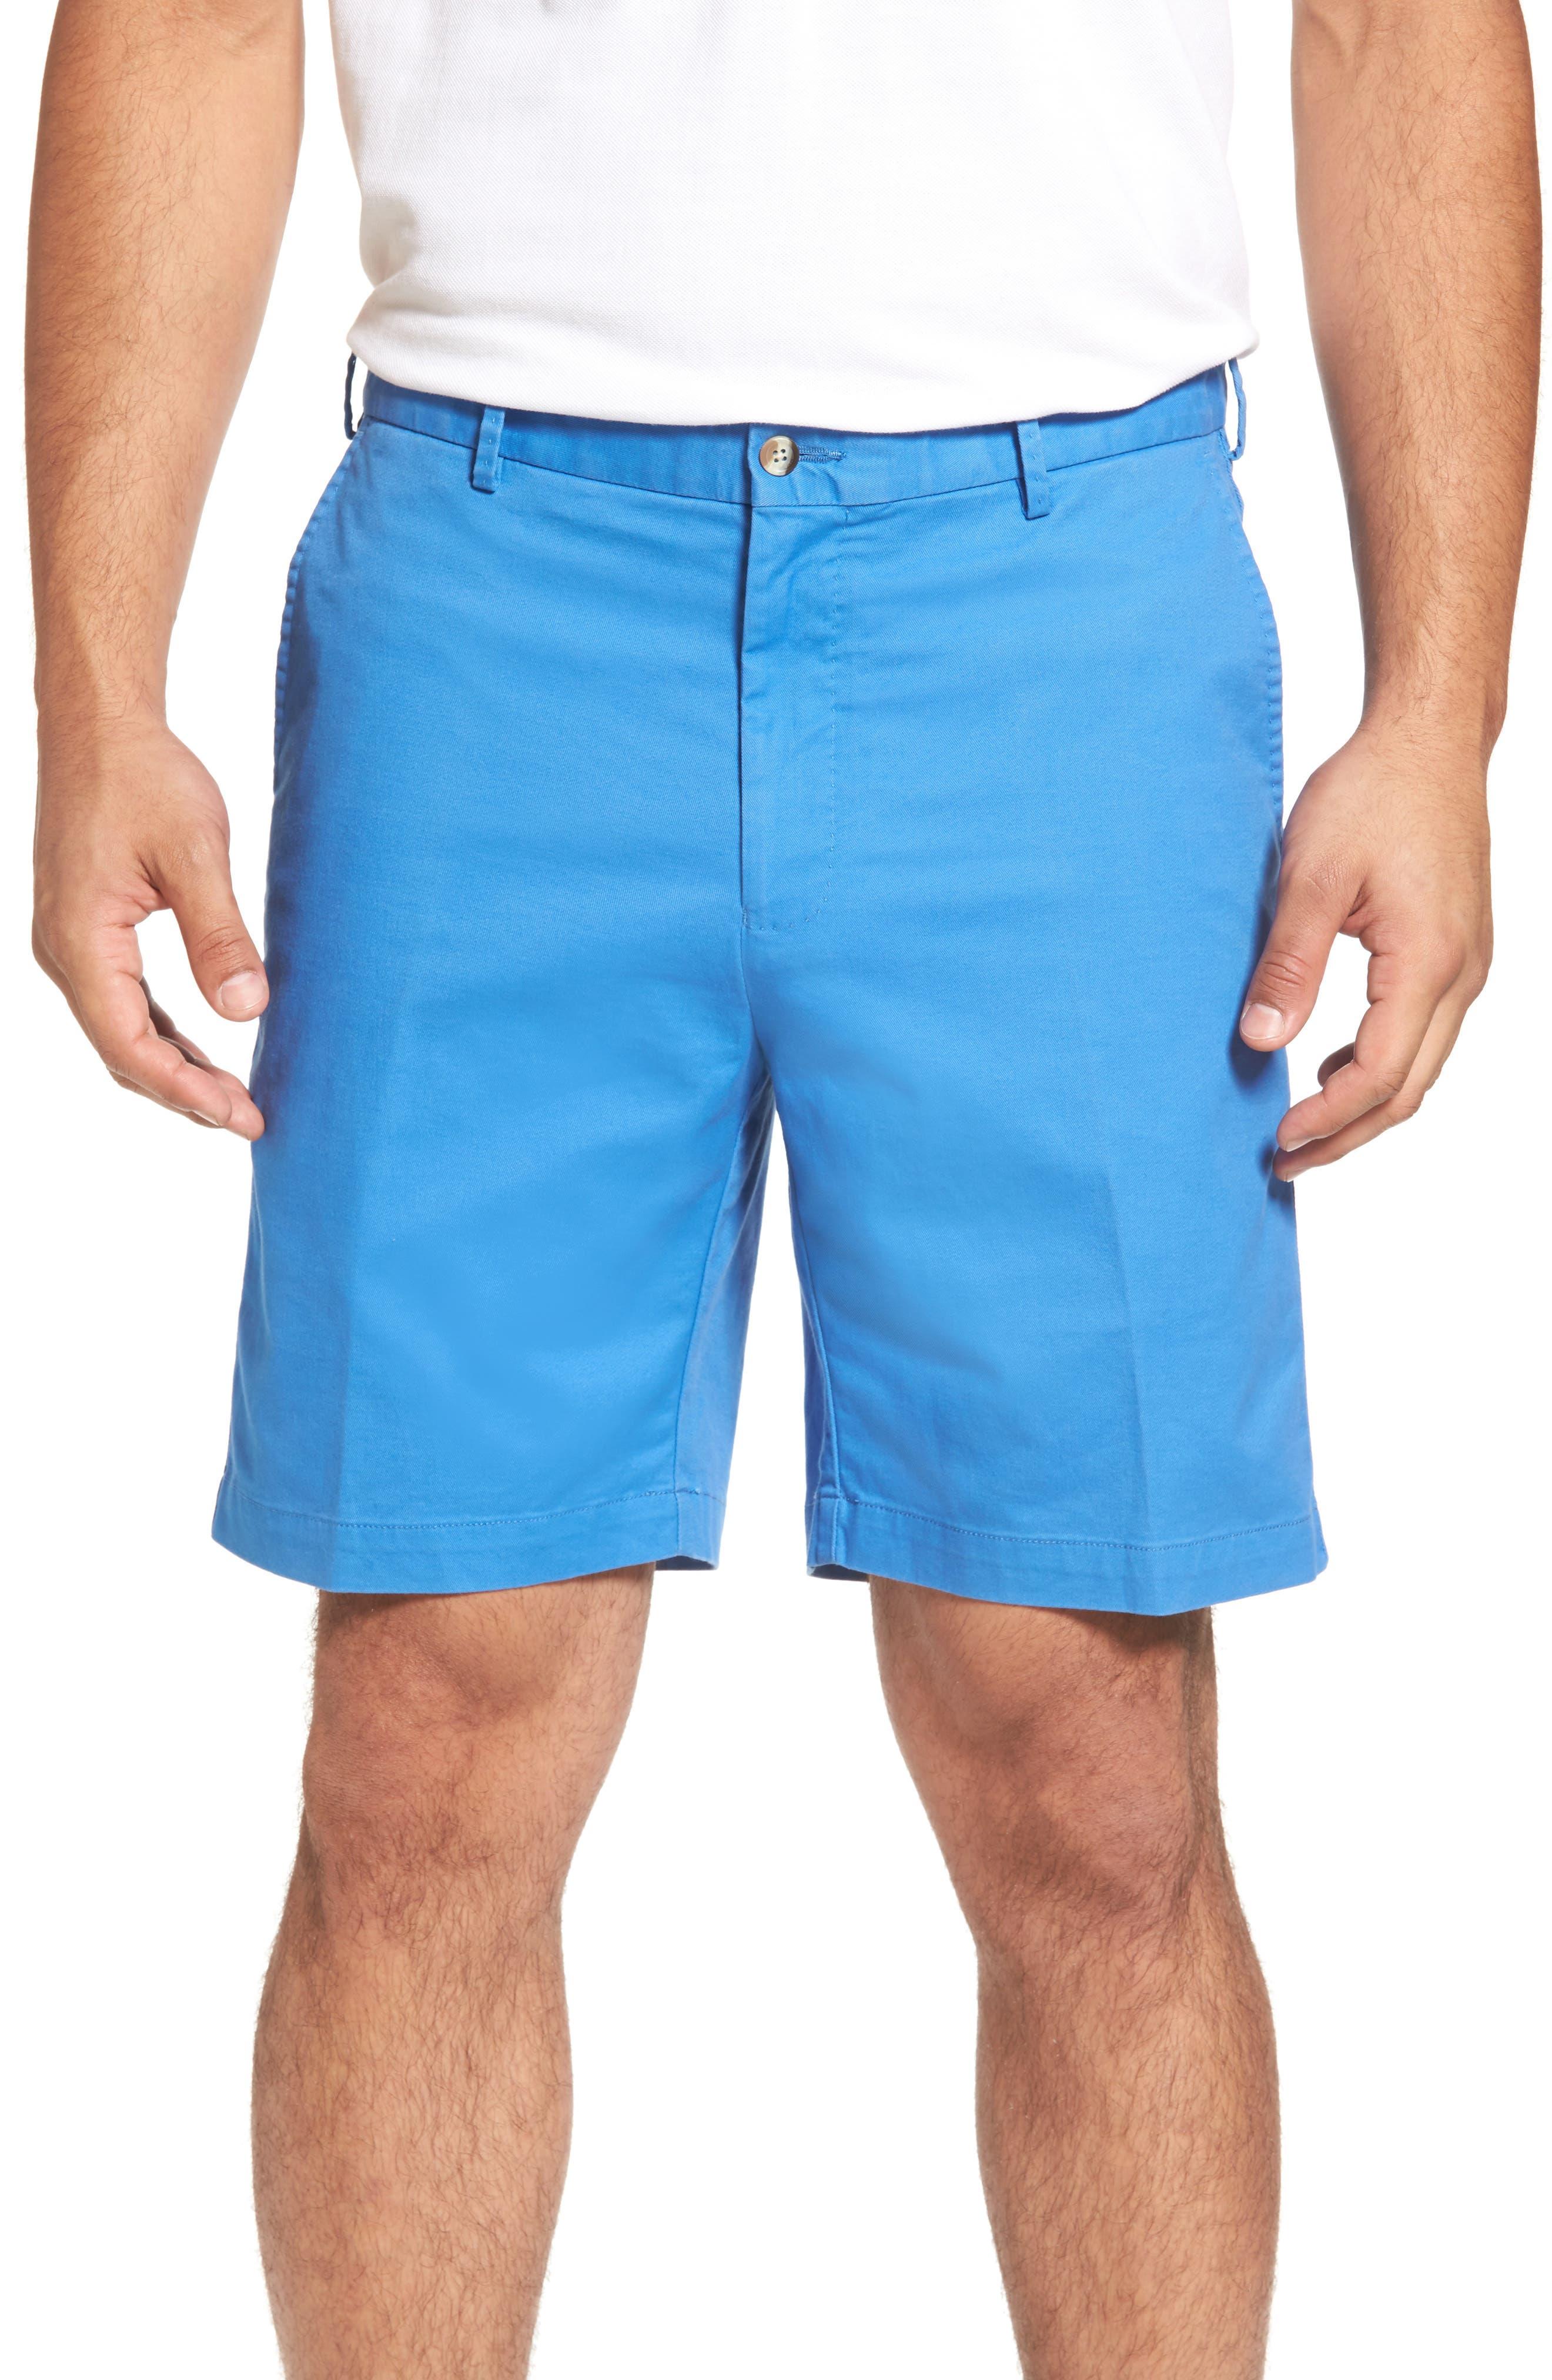 Peter Millar Soft Touch Twill Shorts (Regular & Big)